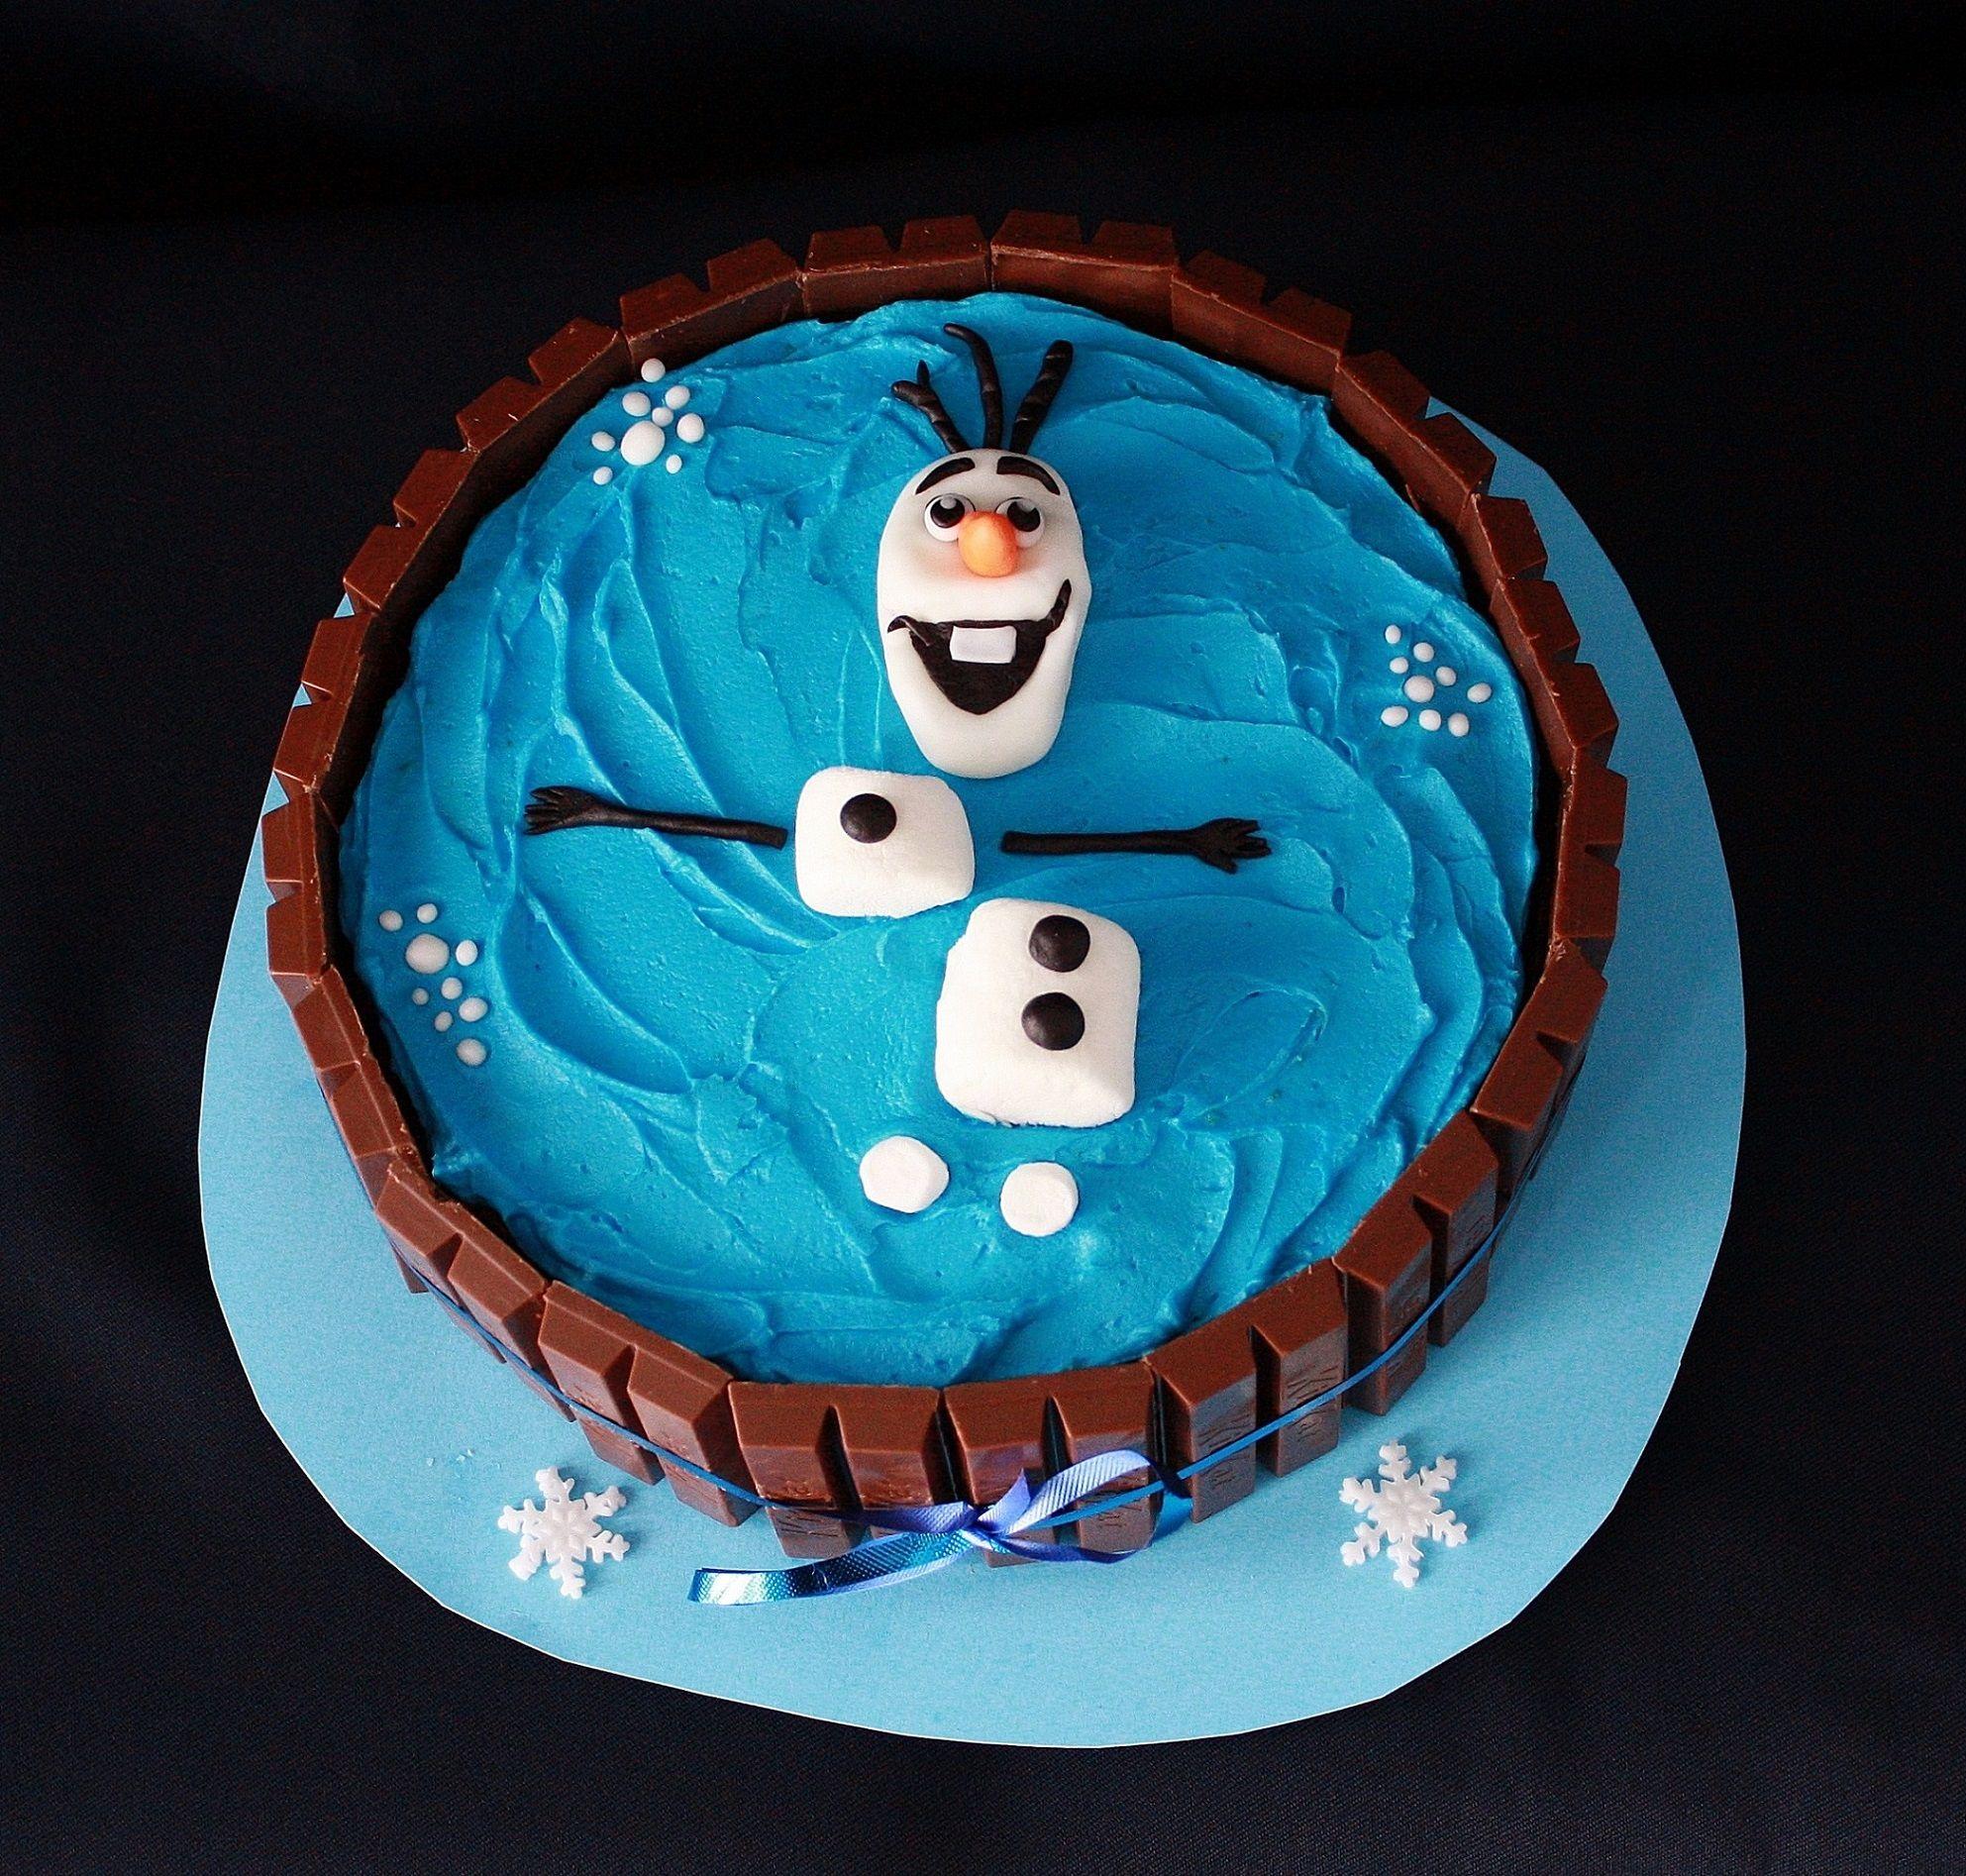 Olaf in a KitKat Cake 3rdRevolution Birthdays Pinterest Kit